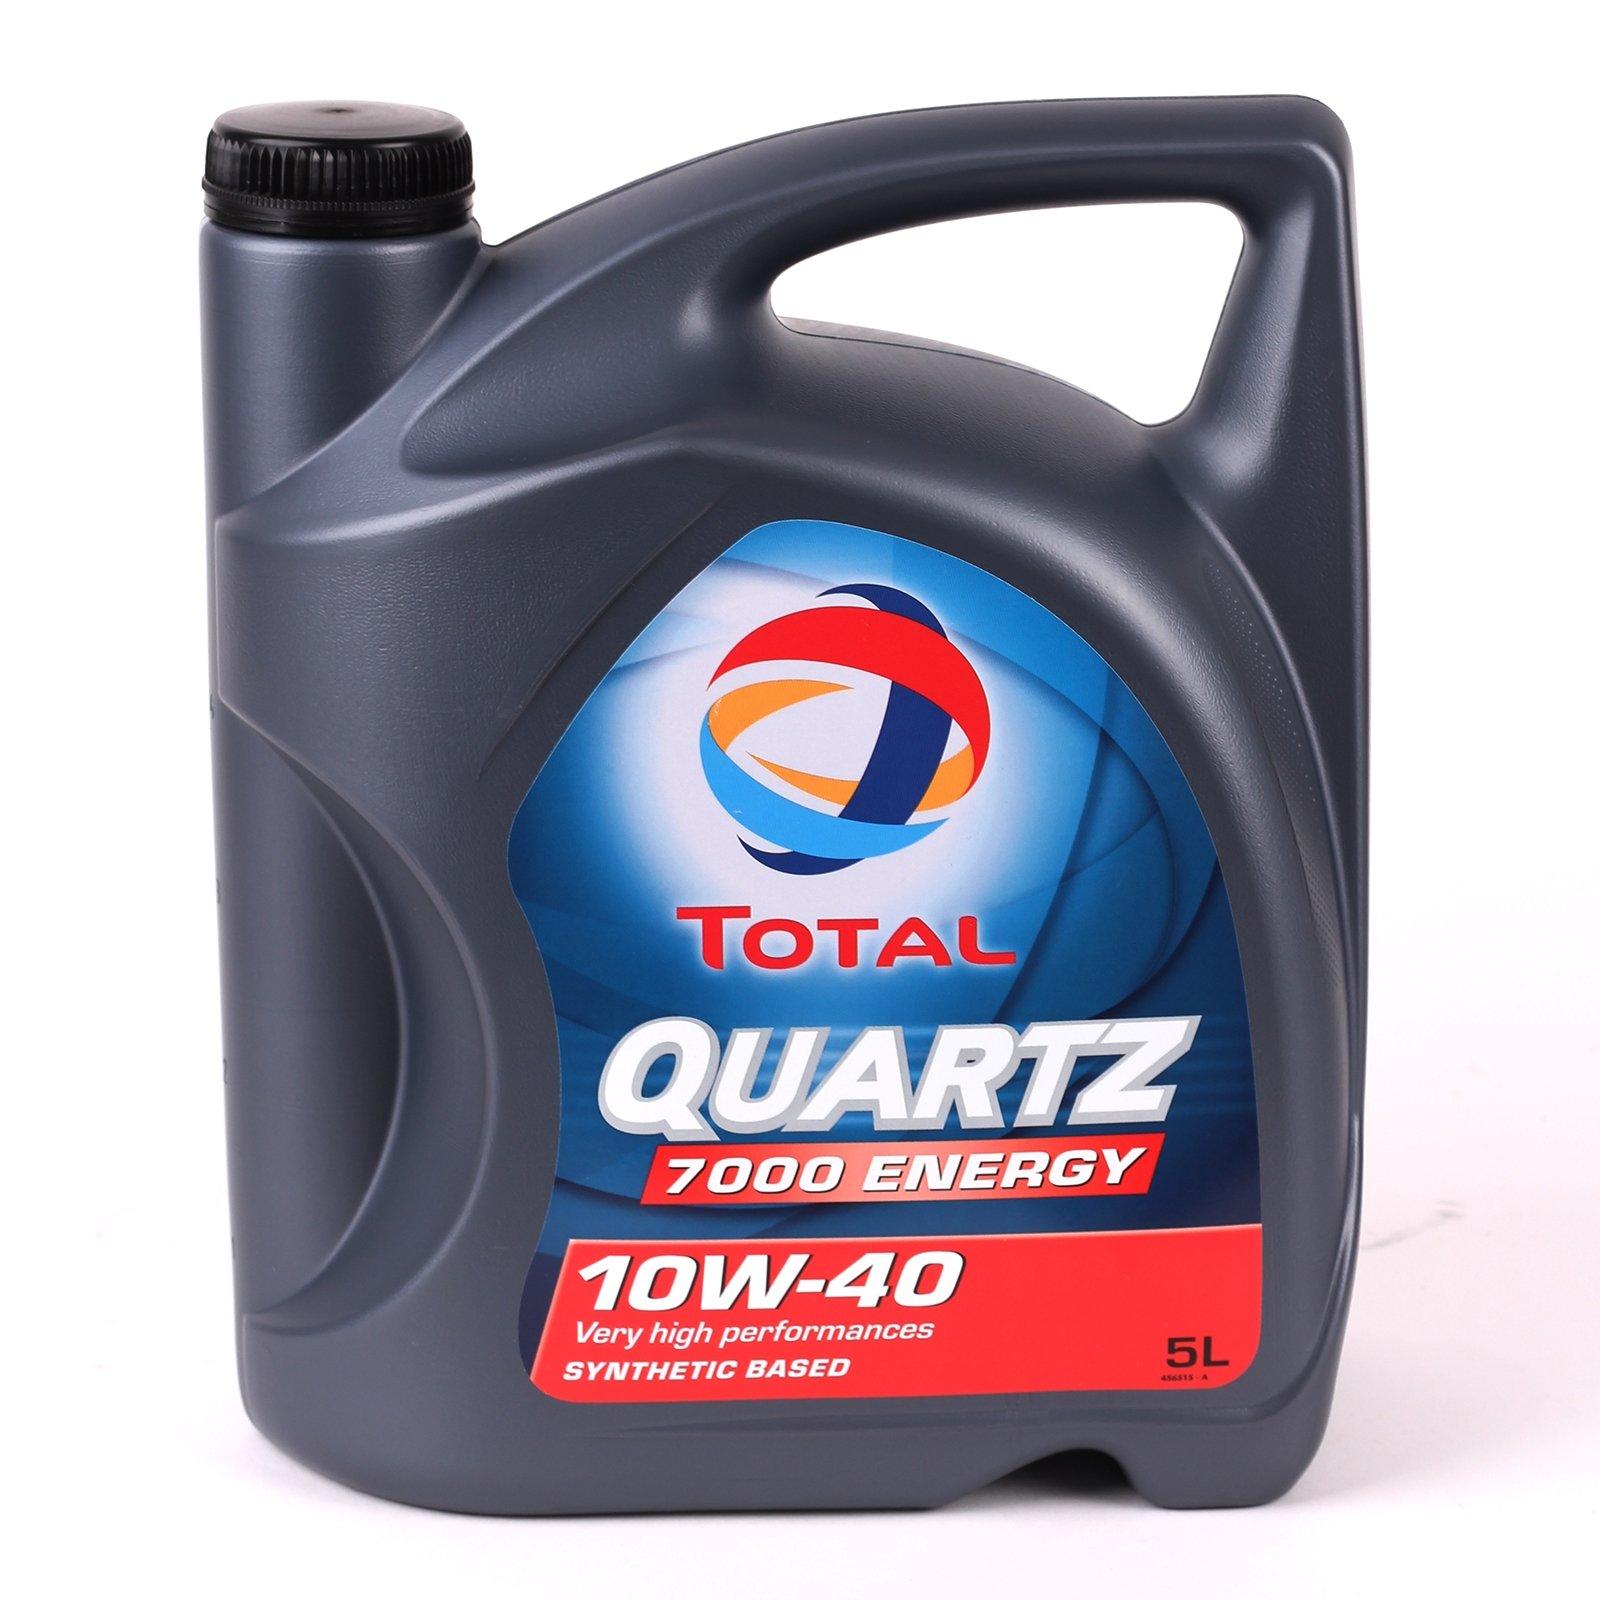 Total Quartz 7000 10W-40 Motor Oil - 5L Bottle